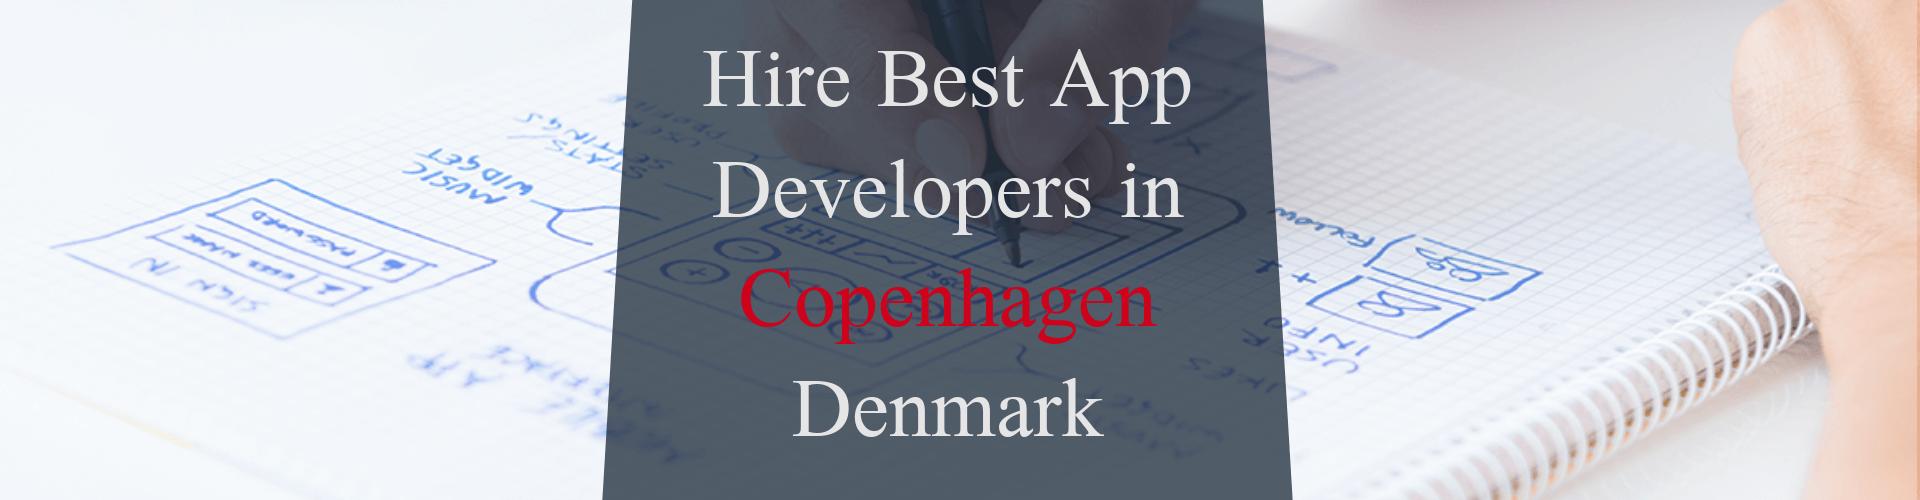 mobile app development company copenhagen